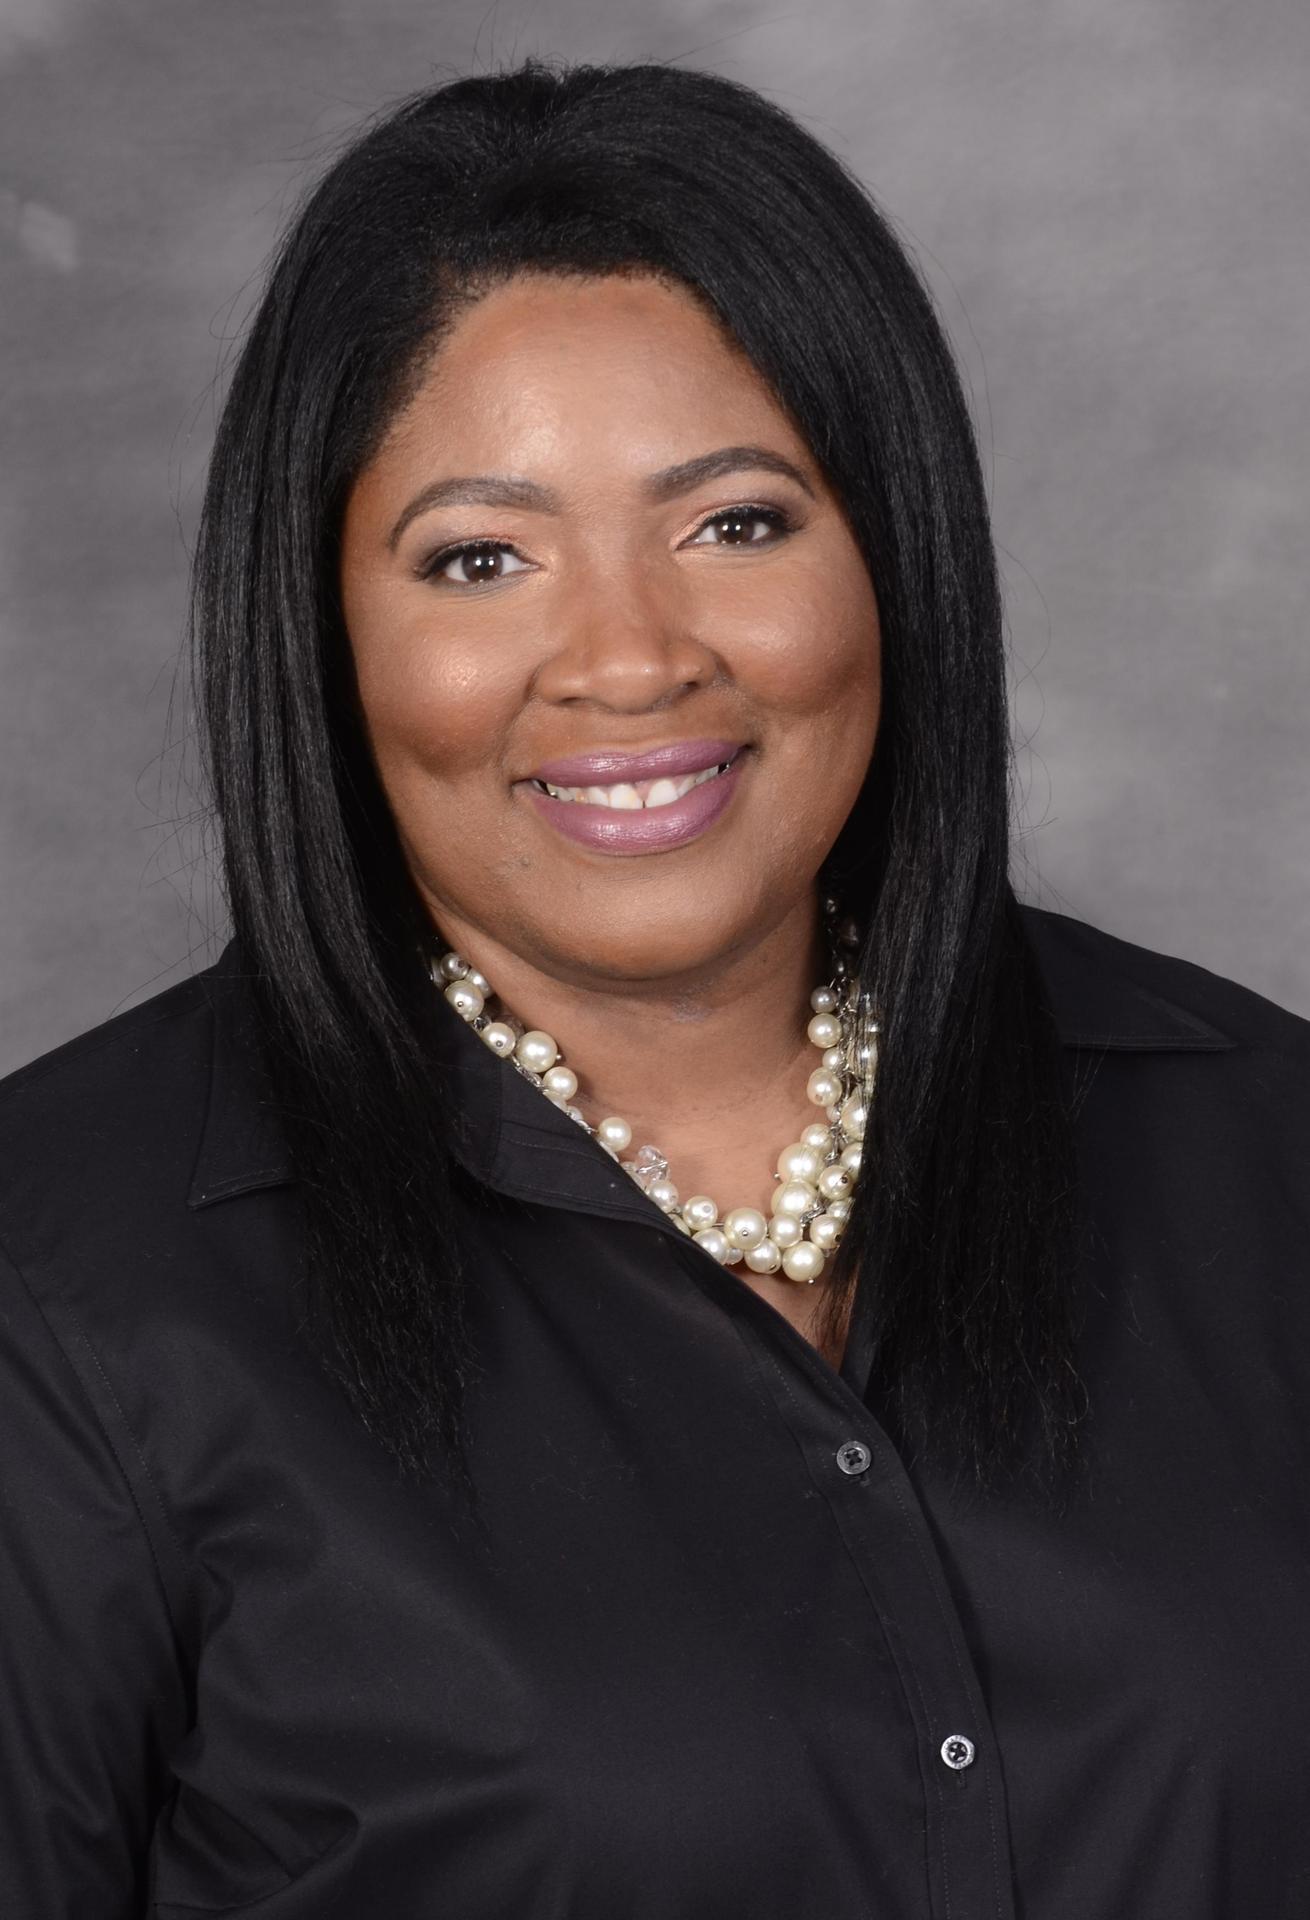 Board Member Tricia Stroud